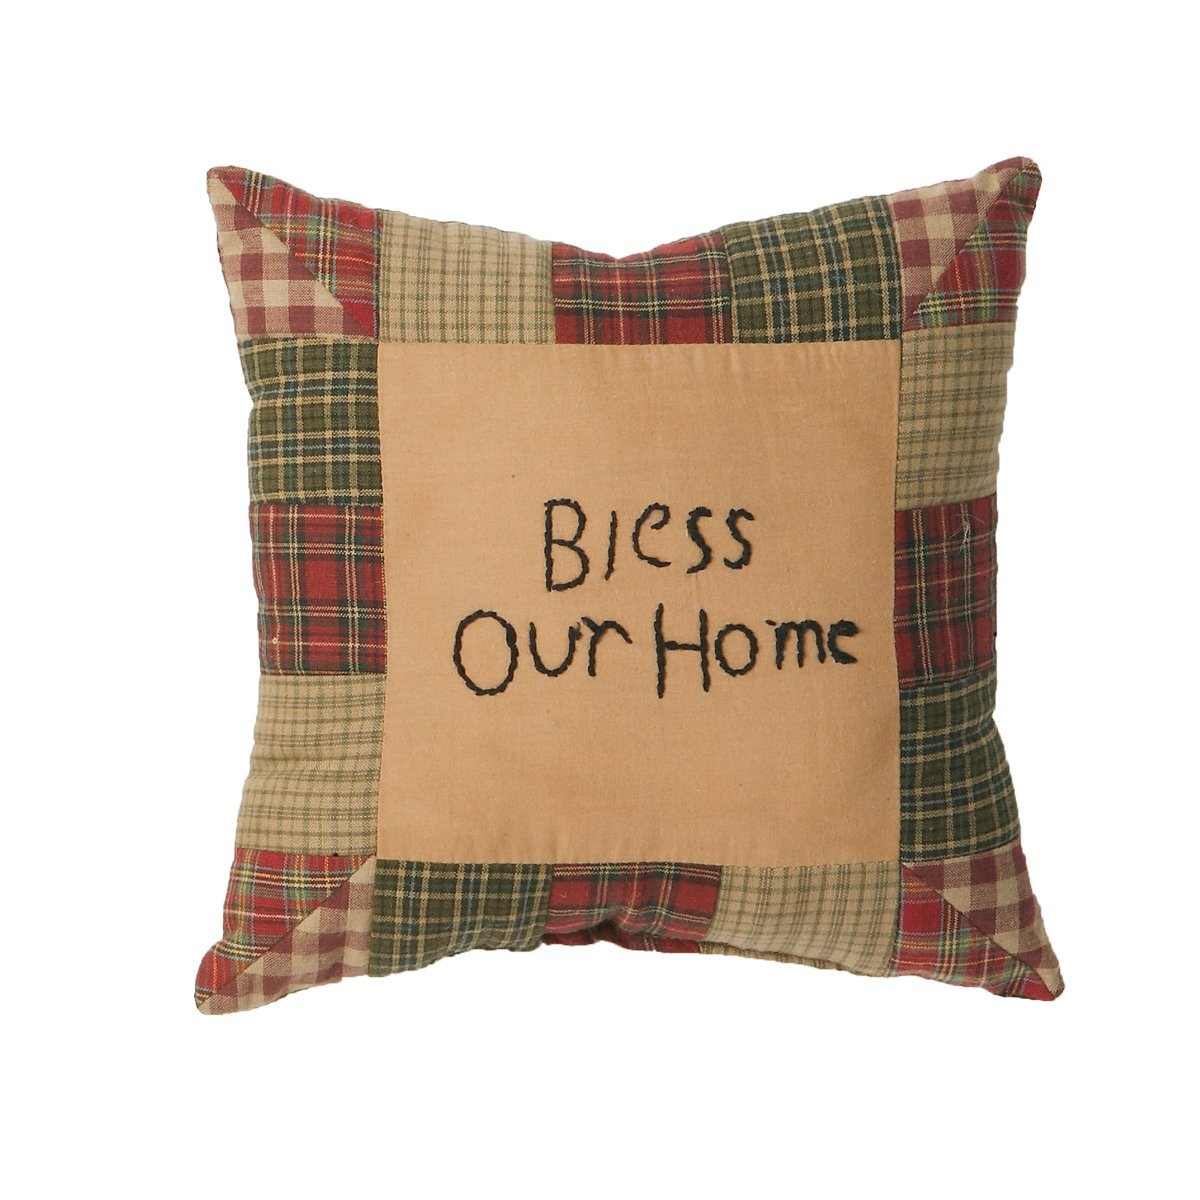 Tea Cabin Bless Our Home Pillow 10x10''